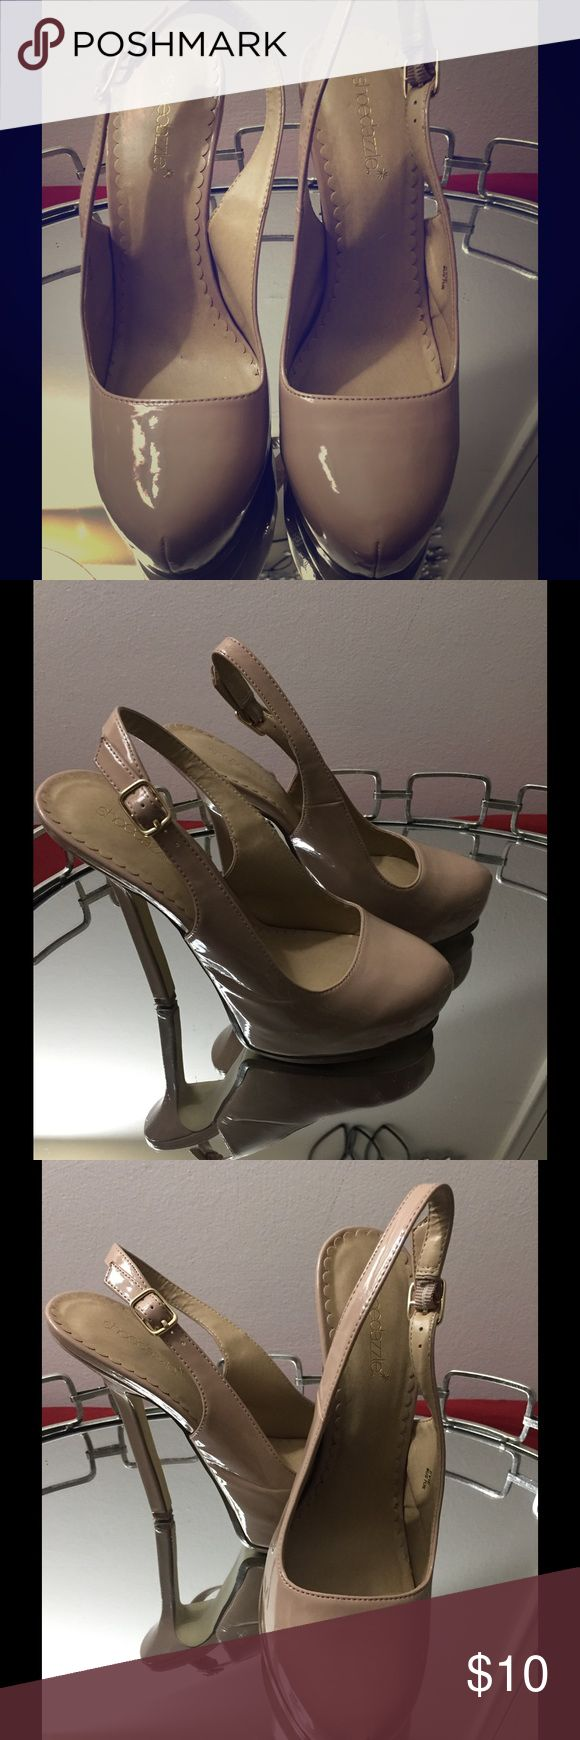 Nude Shoe Dazzle Sling Back Shoe Dazzle Nude Slingback Pump.. In very good condition Shoe Dazzle Shoes Heels